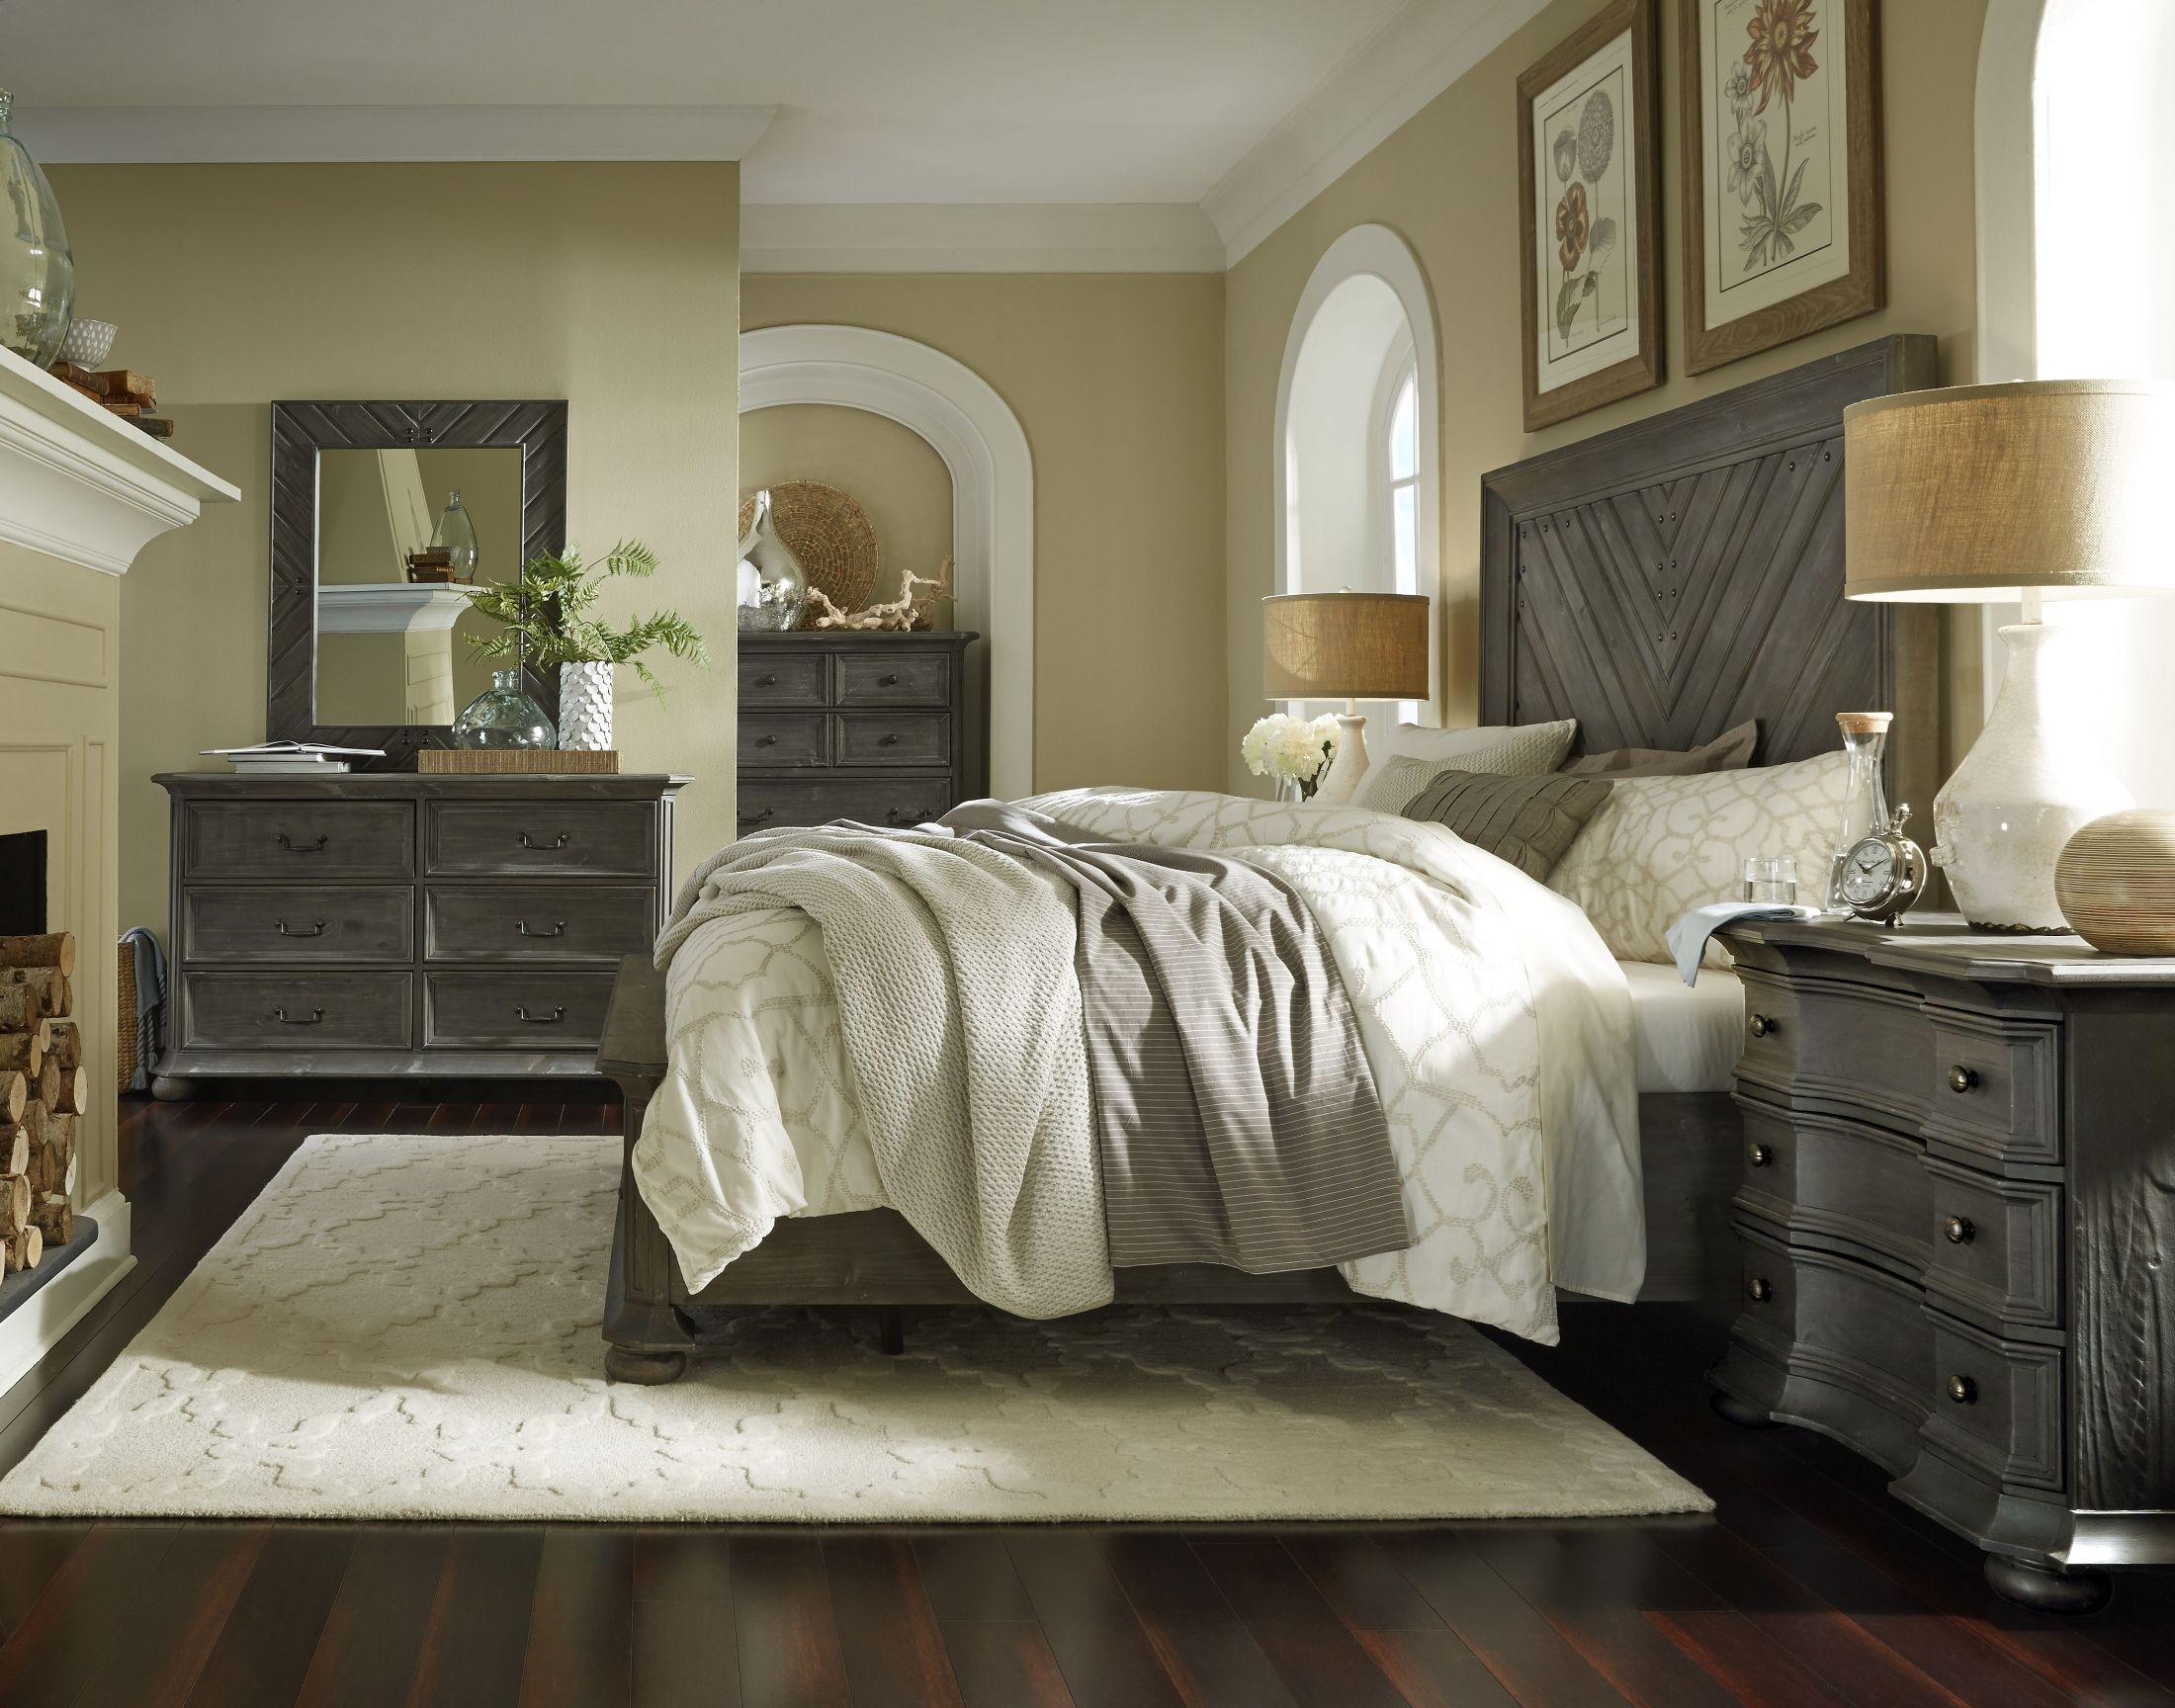 Cheswick Washed Linen Grey Panel Storage Bedroom Set B4095 54h 55f 54r Magnussen Home